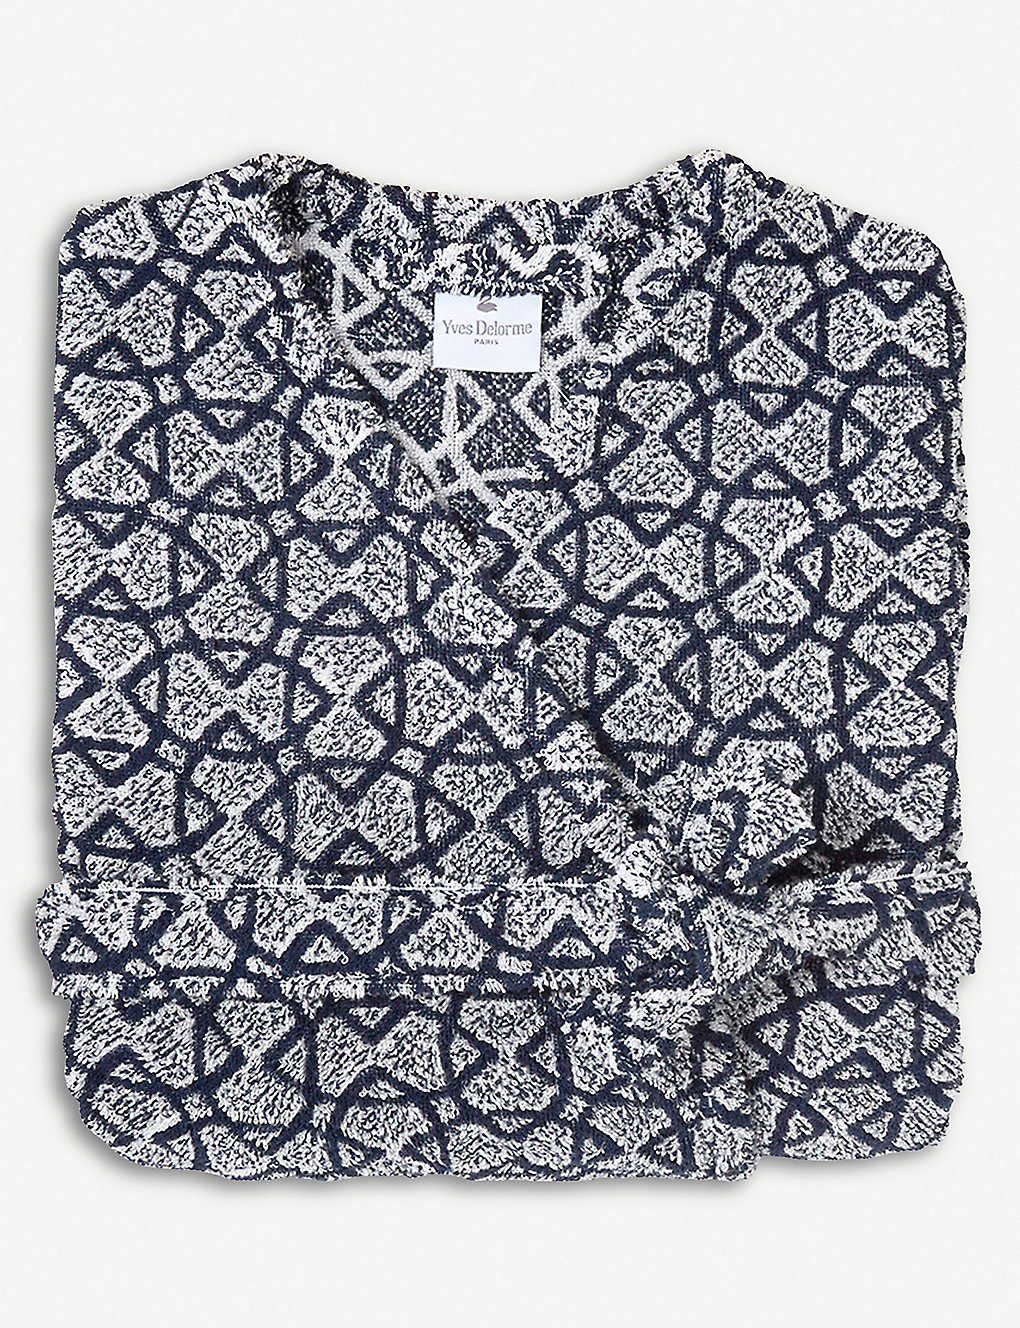 YVES DELORME - Entrelacs Marine cotton bath robe  b6b458499